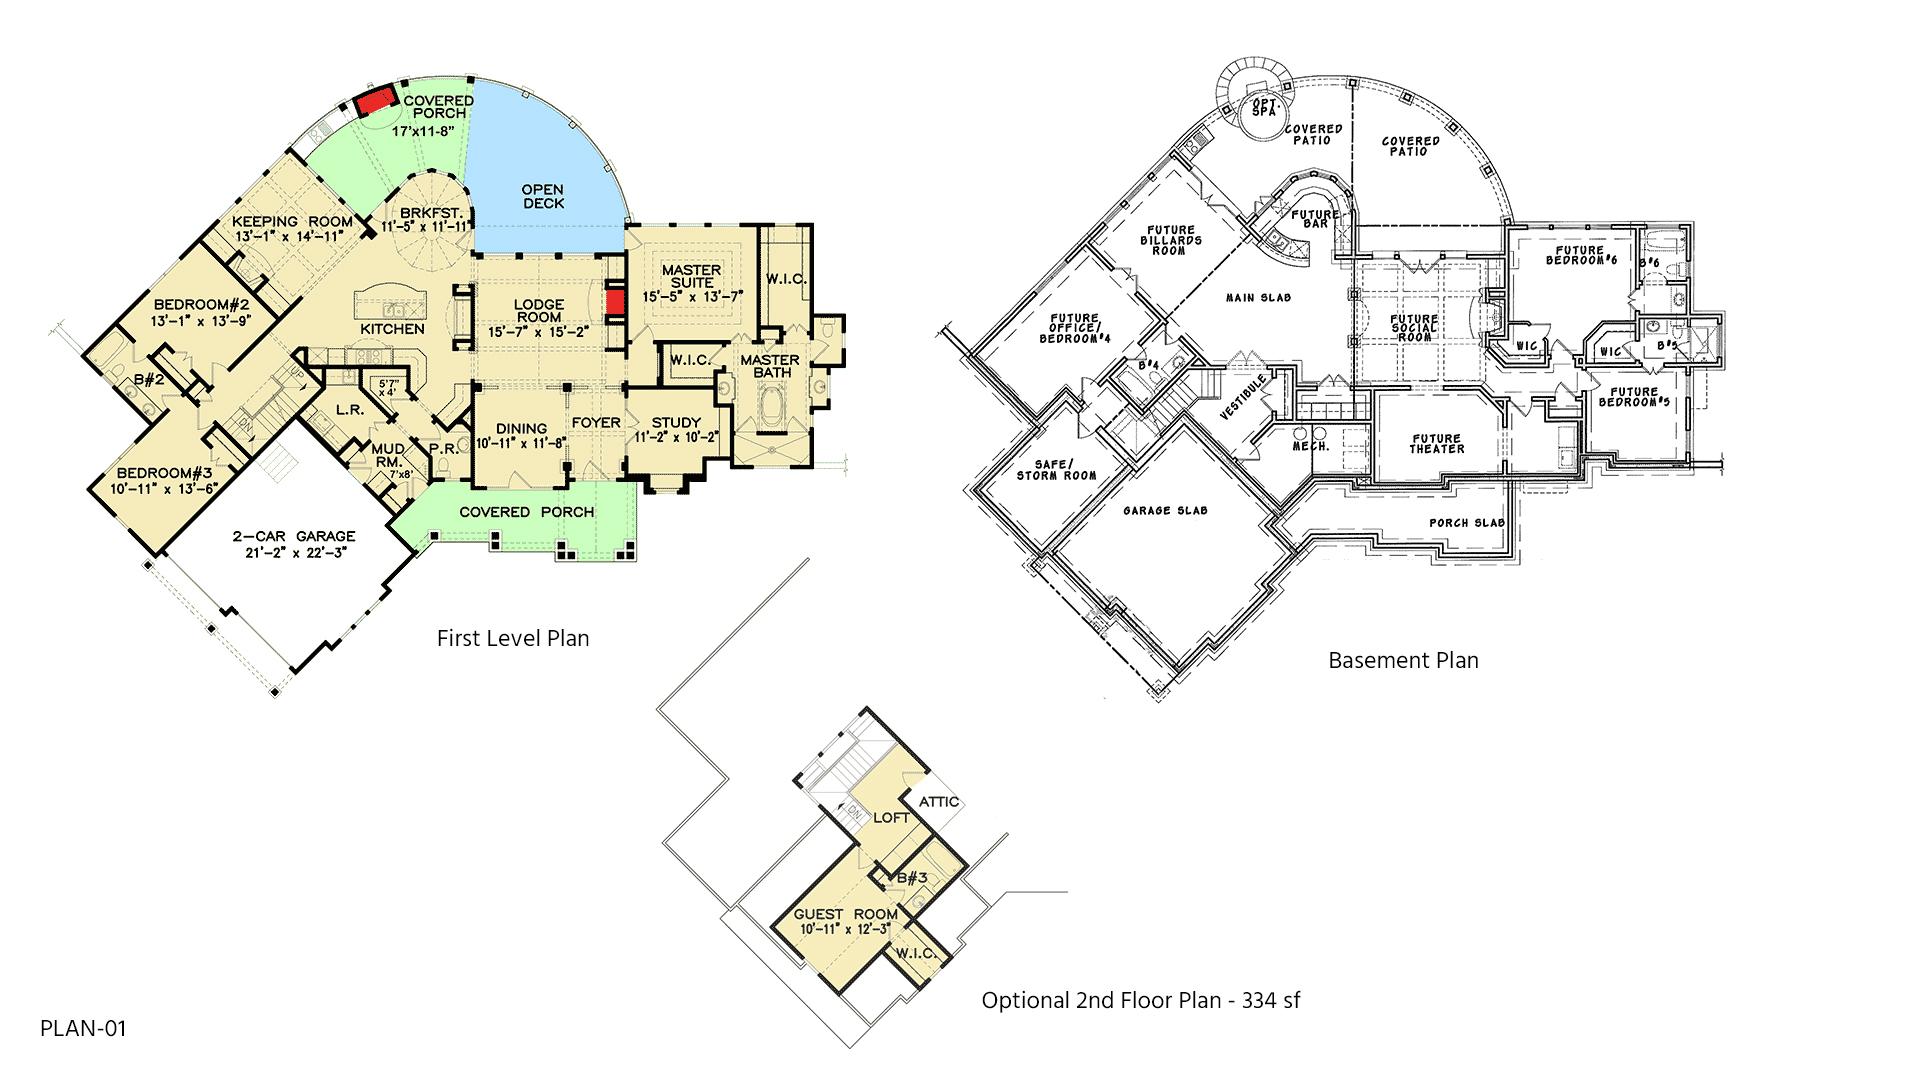 01 - home plan 1920 x 1080